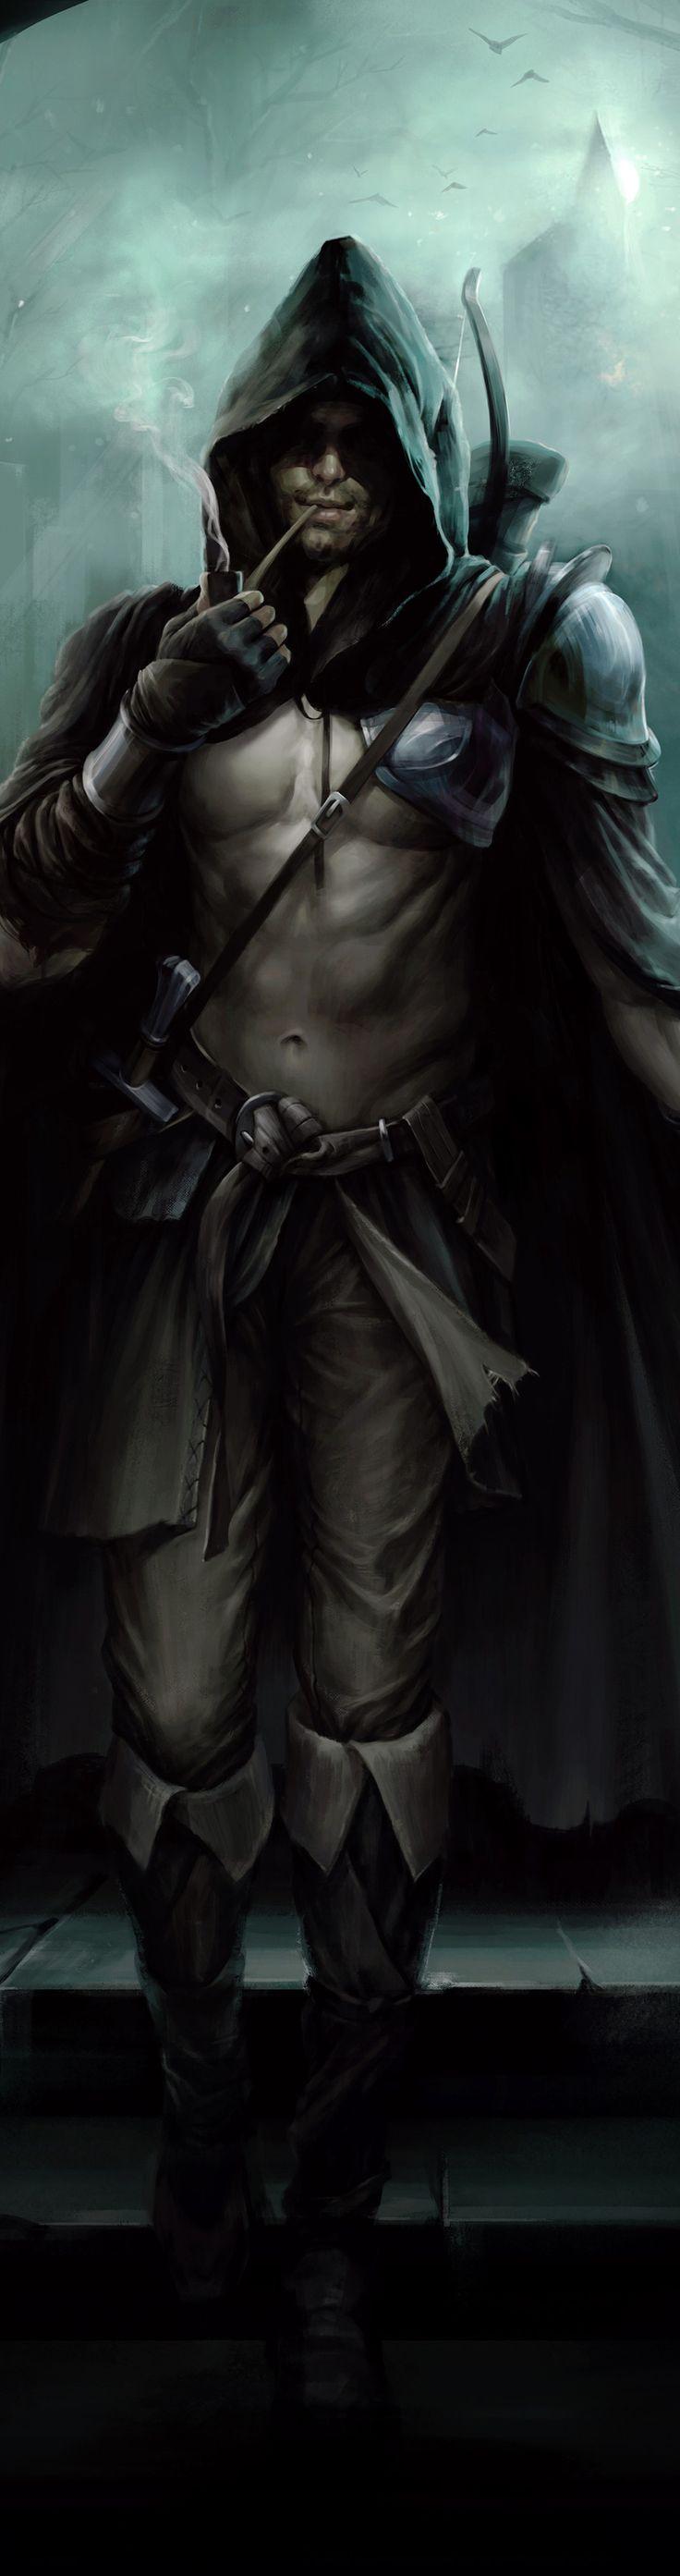 Strider by Siwoo Kim (detail)